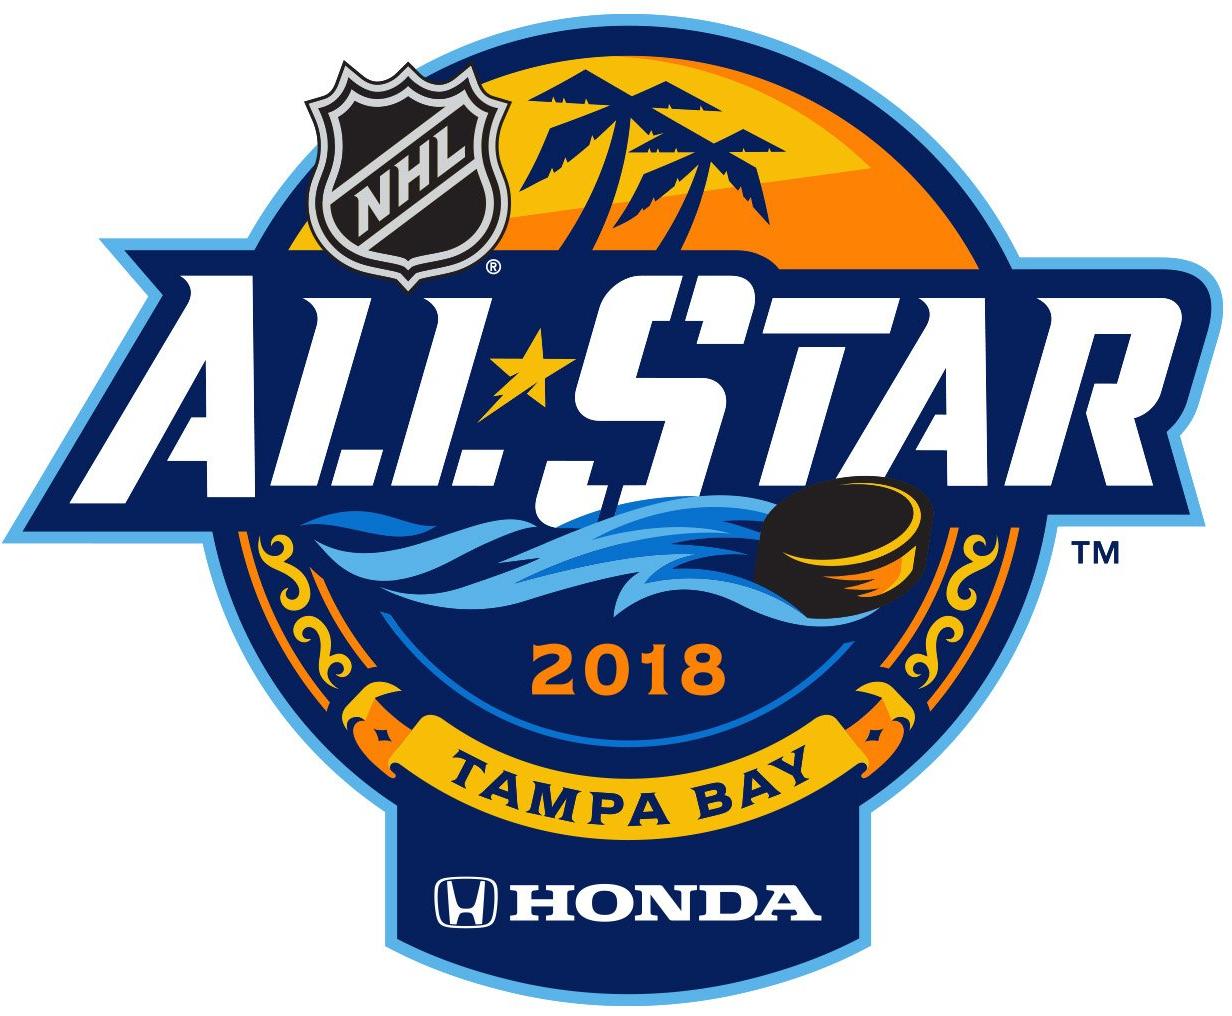 2018 NBA All-Star Game - Wikipedia